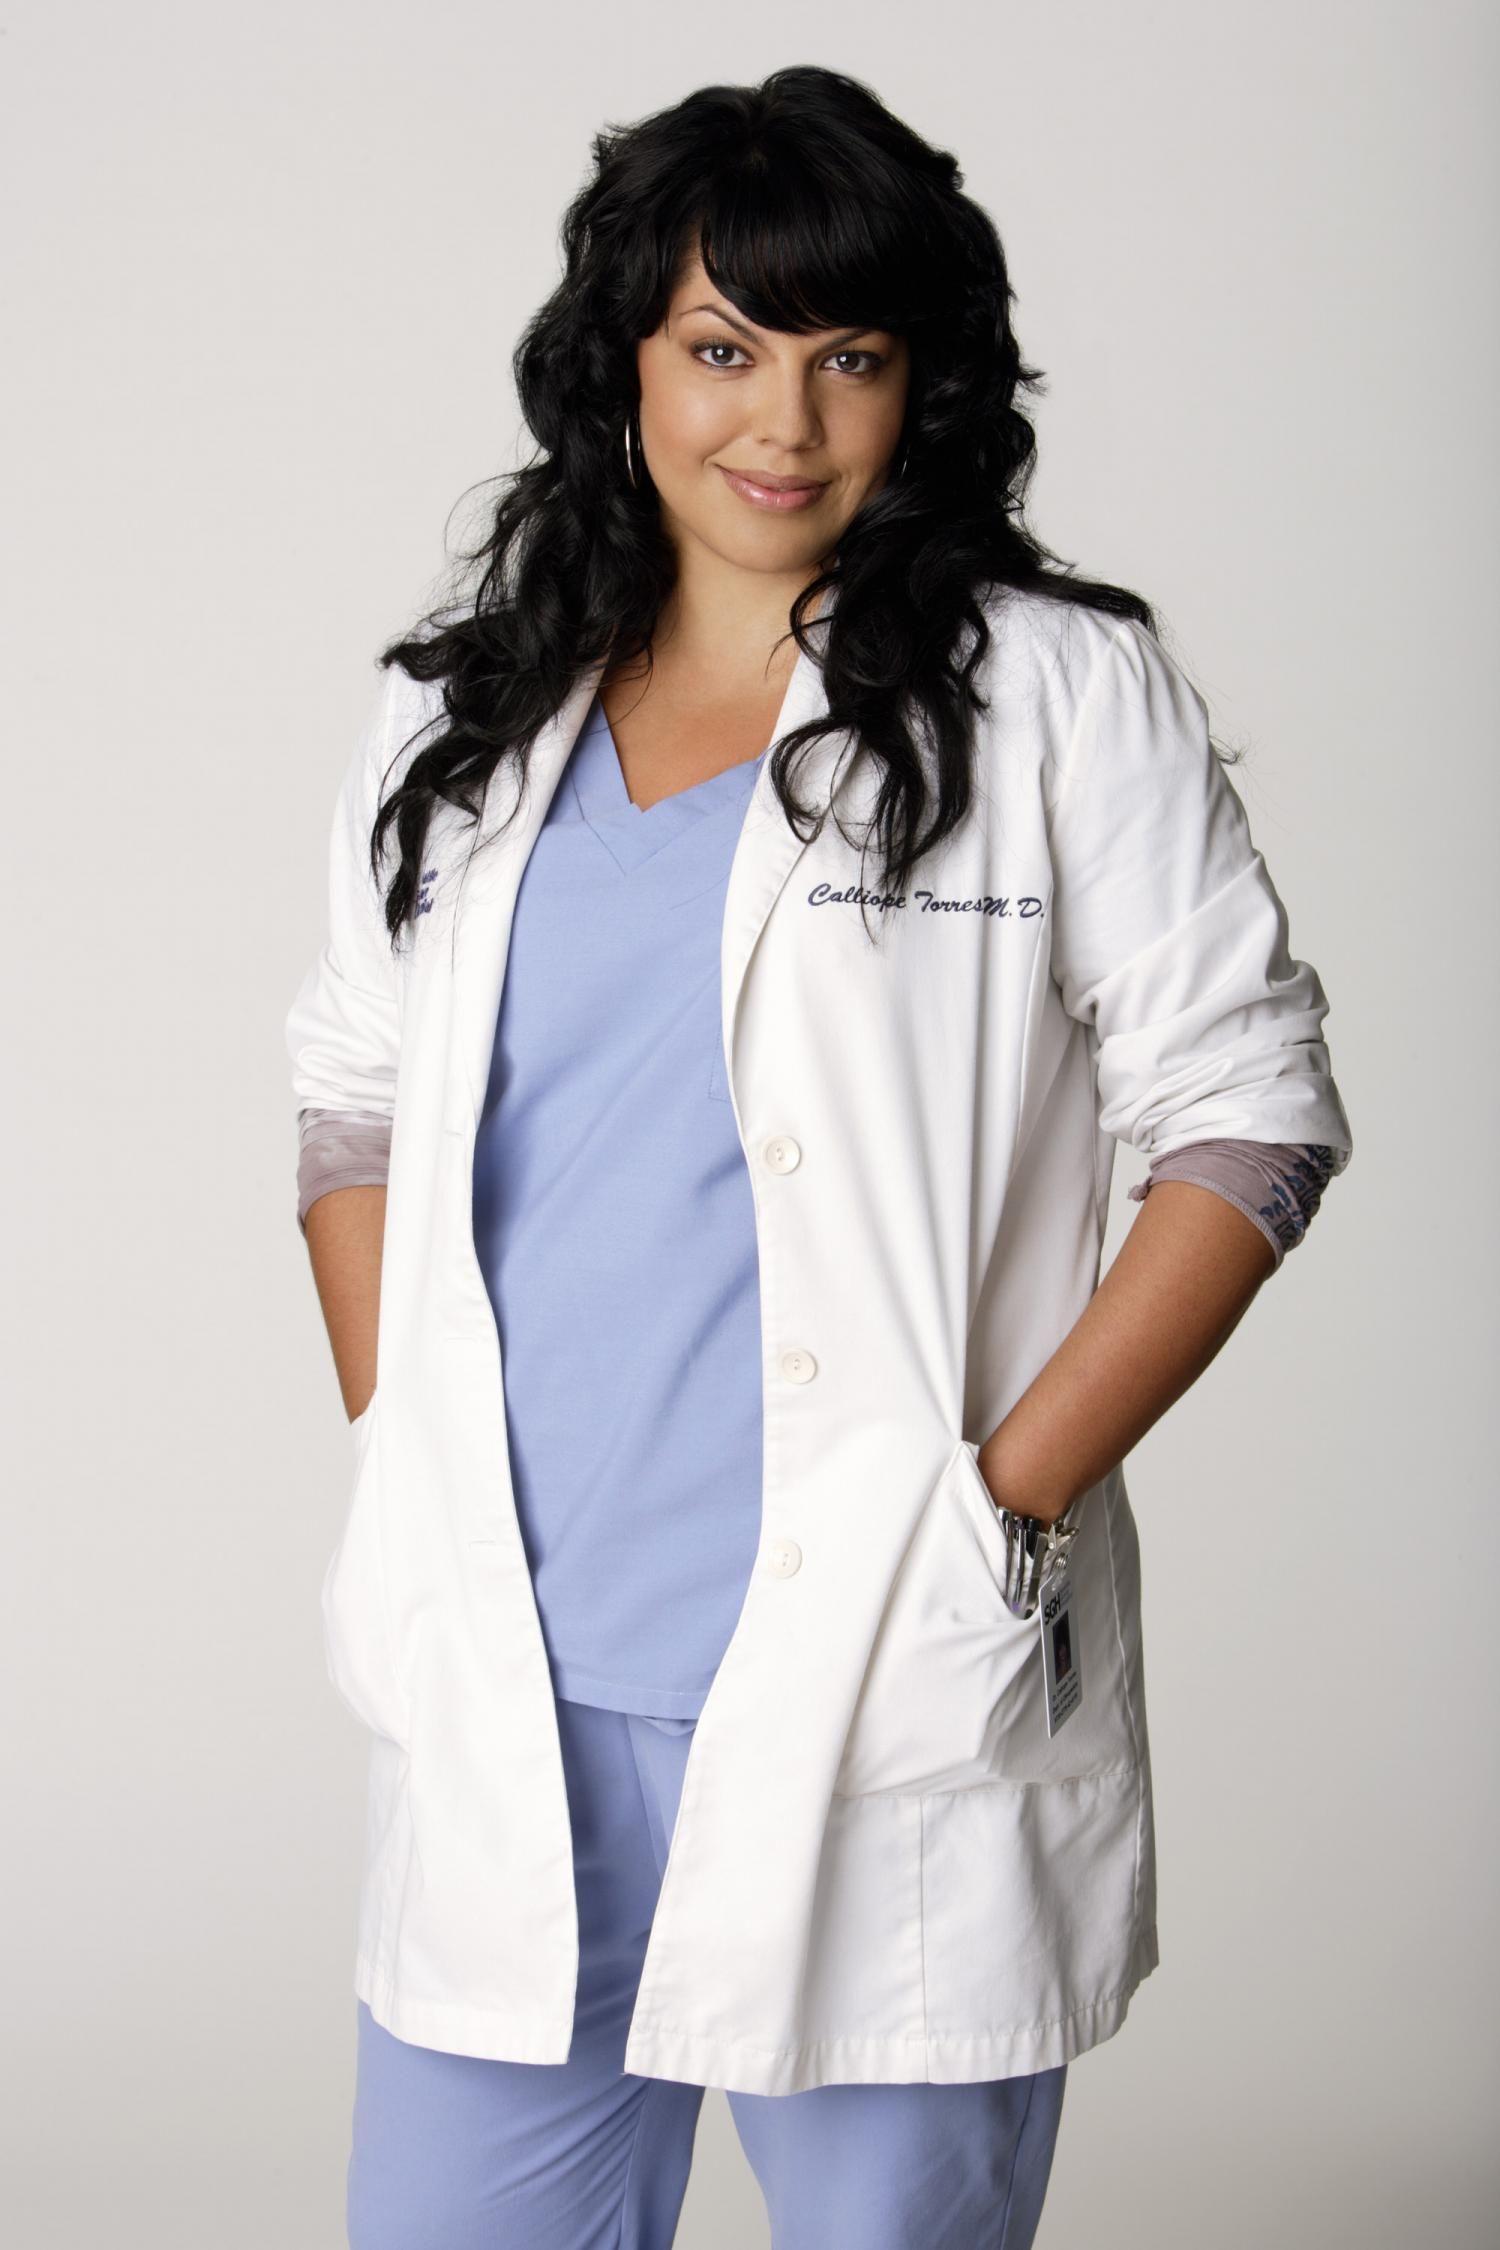 Grey\'s Anatomy - Season 2 Promo | Grey\'s Anatomy | Pinterest | Anatomy